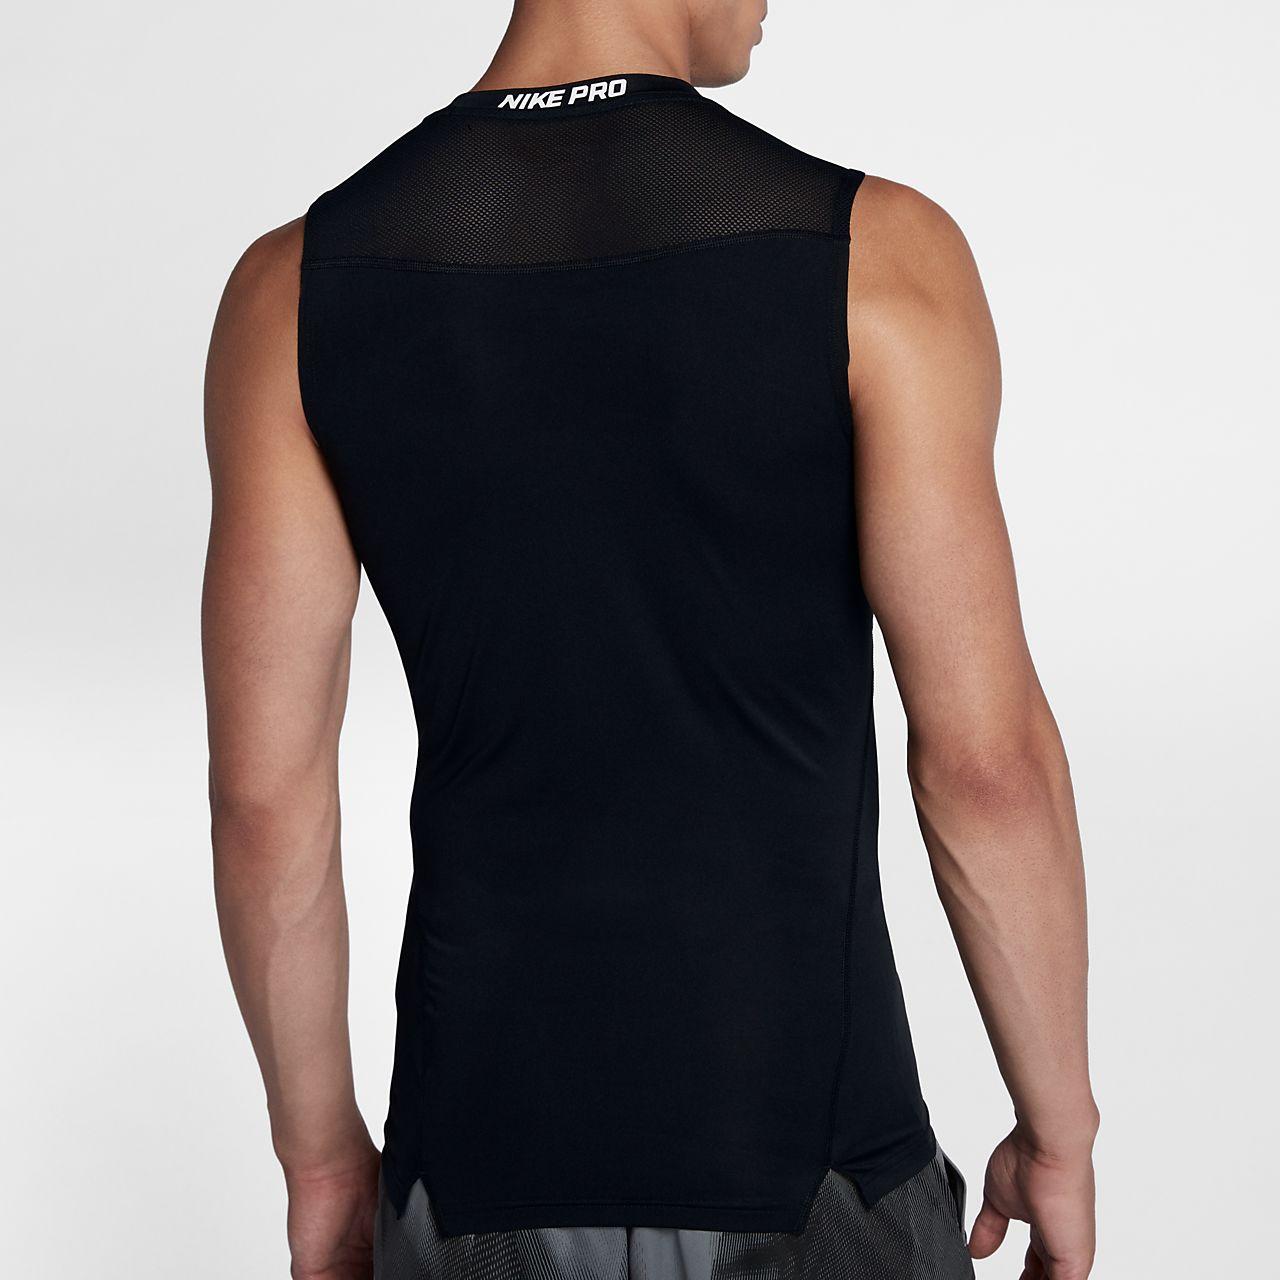 821670c2b09 Nike Pro Men s Sleeveless Training Top. Nike.com IE